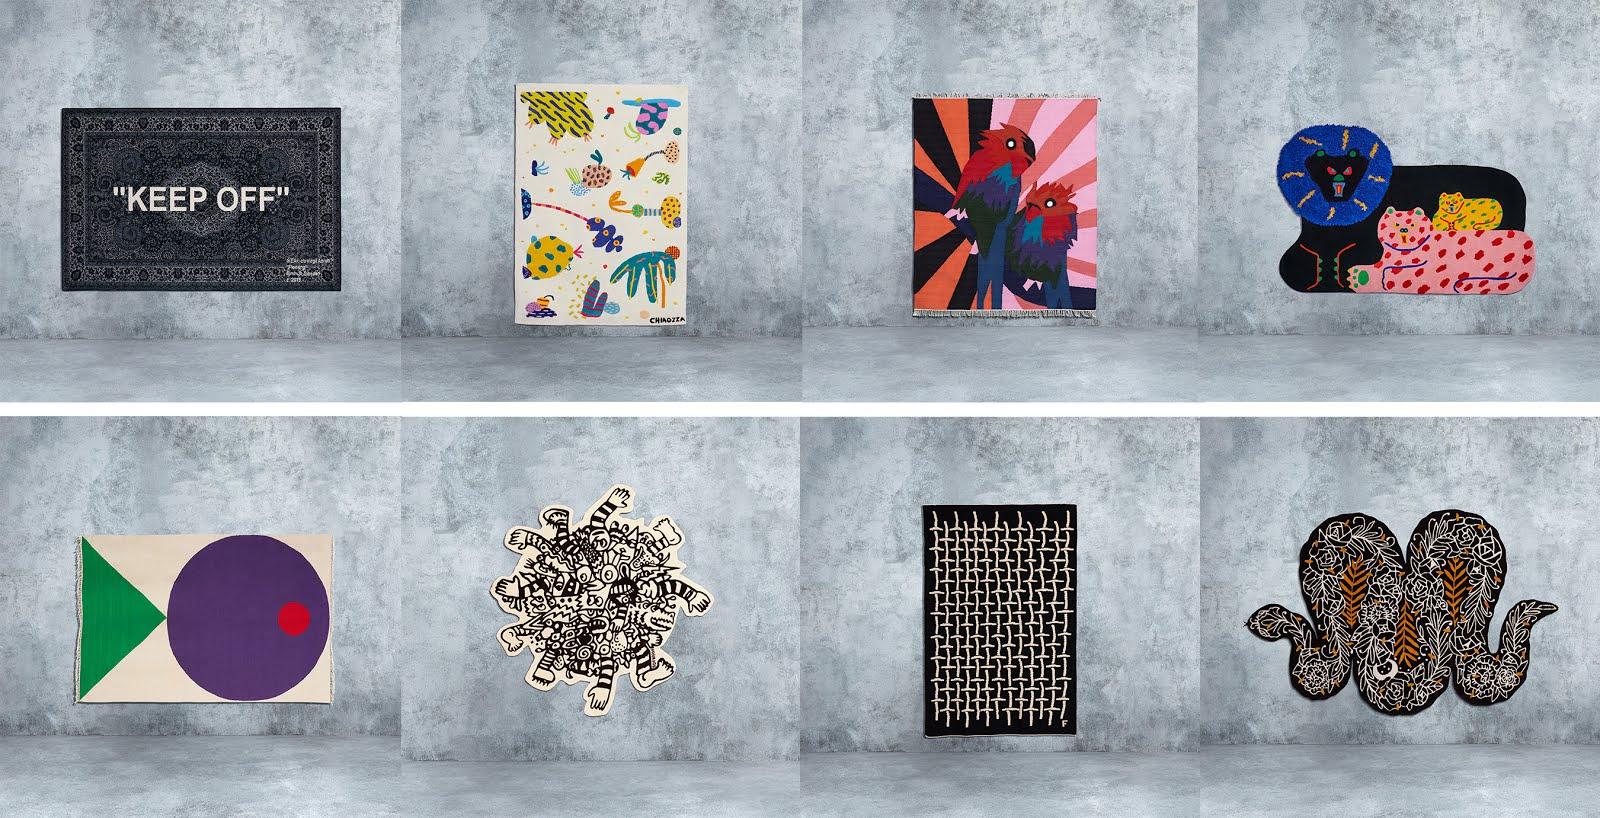 Ikea Art collection 2019, Virgil abloh, chiazzo, craig green, misaki kawai, seulgi lee, noah lyon, filip pagowski, carpet, tapijt, kunst, belgie, ikea anderlecht